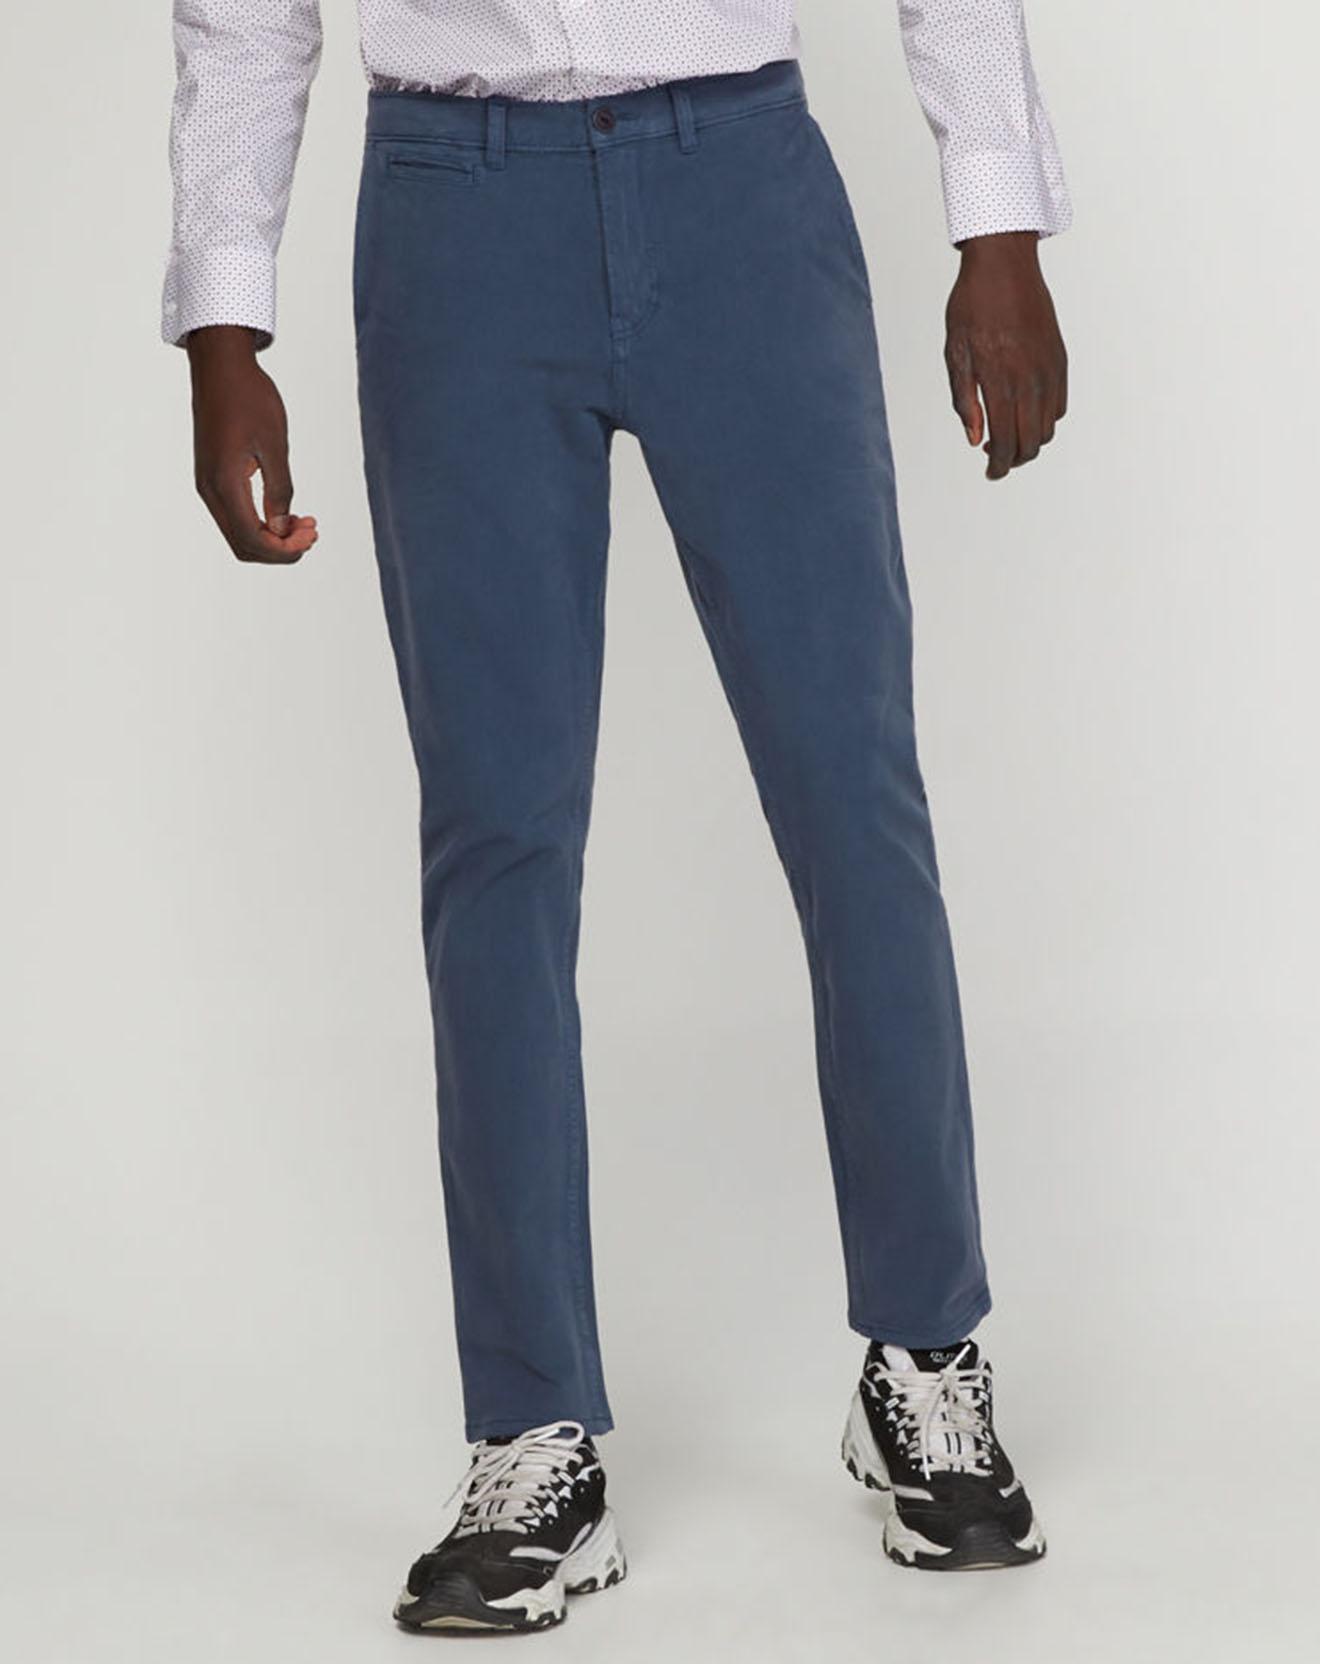 Pantalon chino Slim Krandi bleu - Quiksilver - Modalova